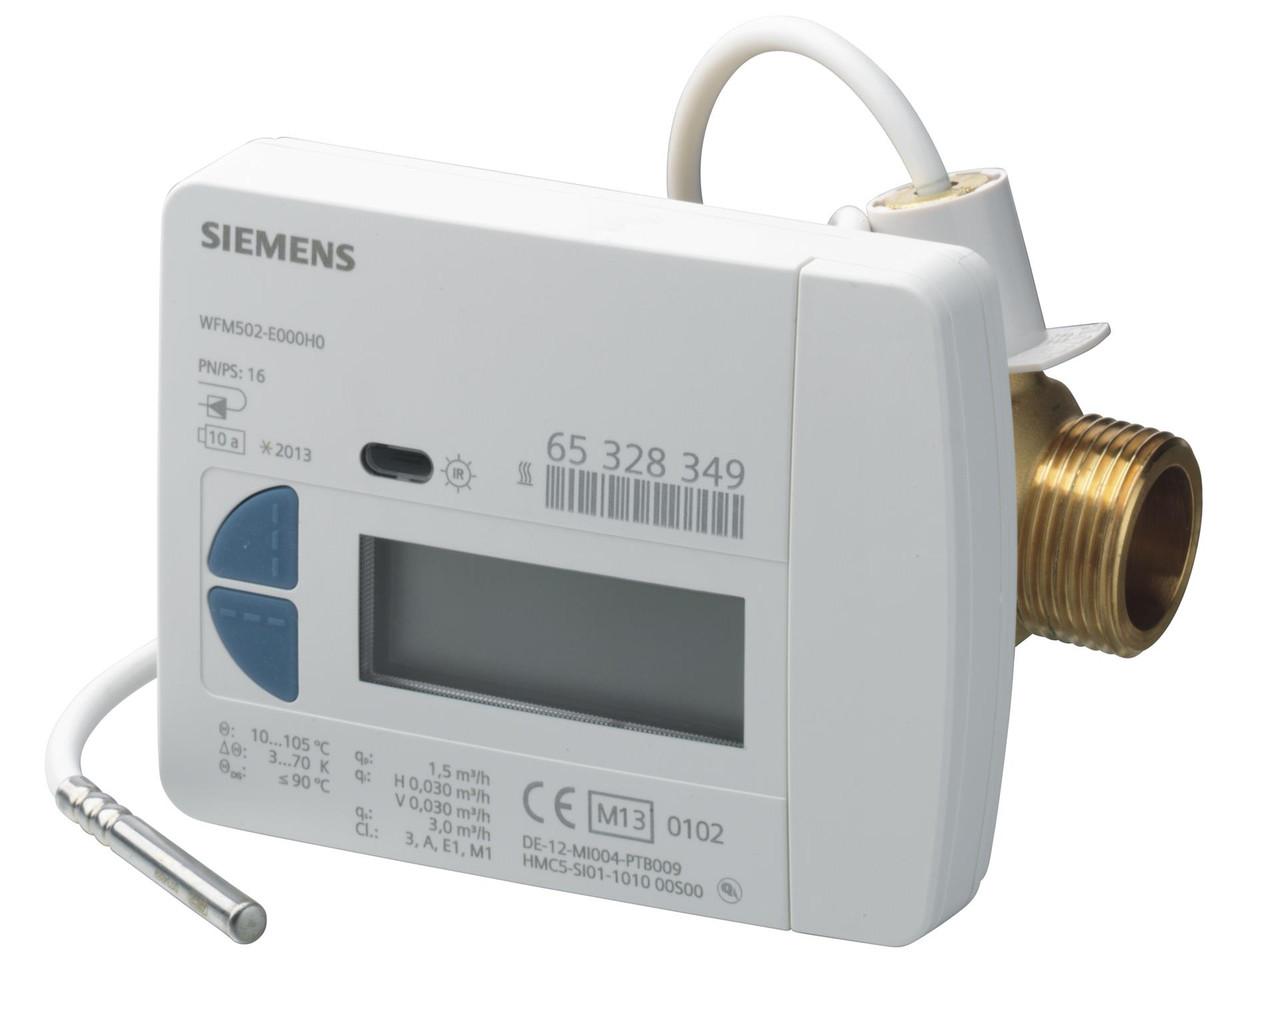 Siemens WFM502-E000H0 Impeller type heat meter, nominal flow rate 1.5 m3/h